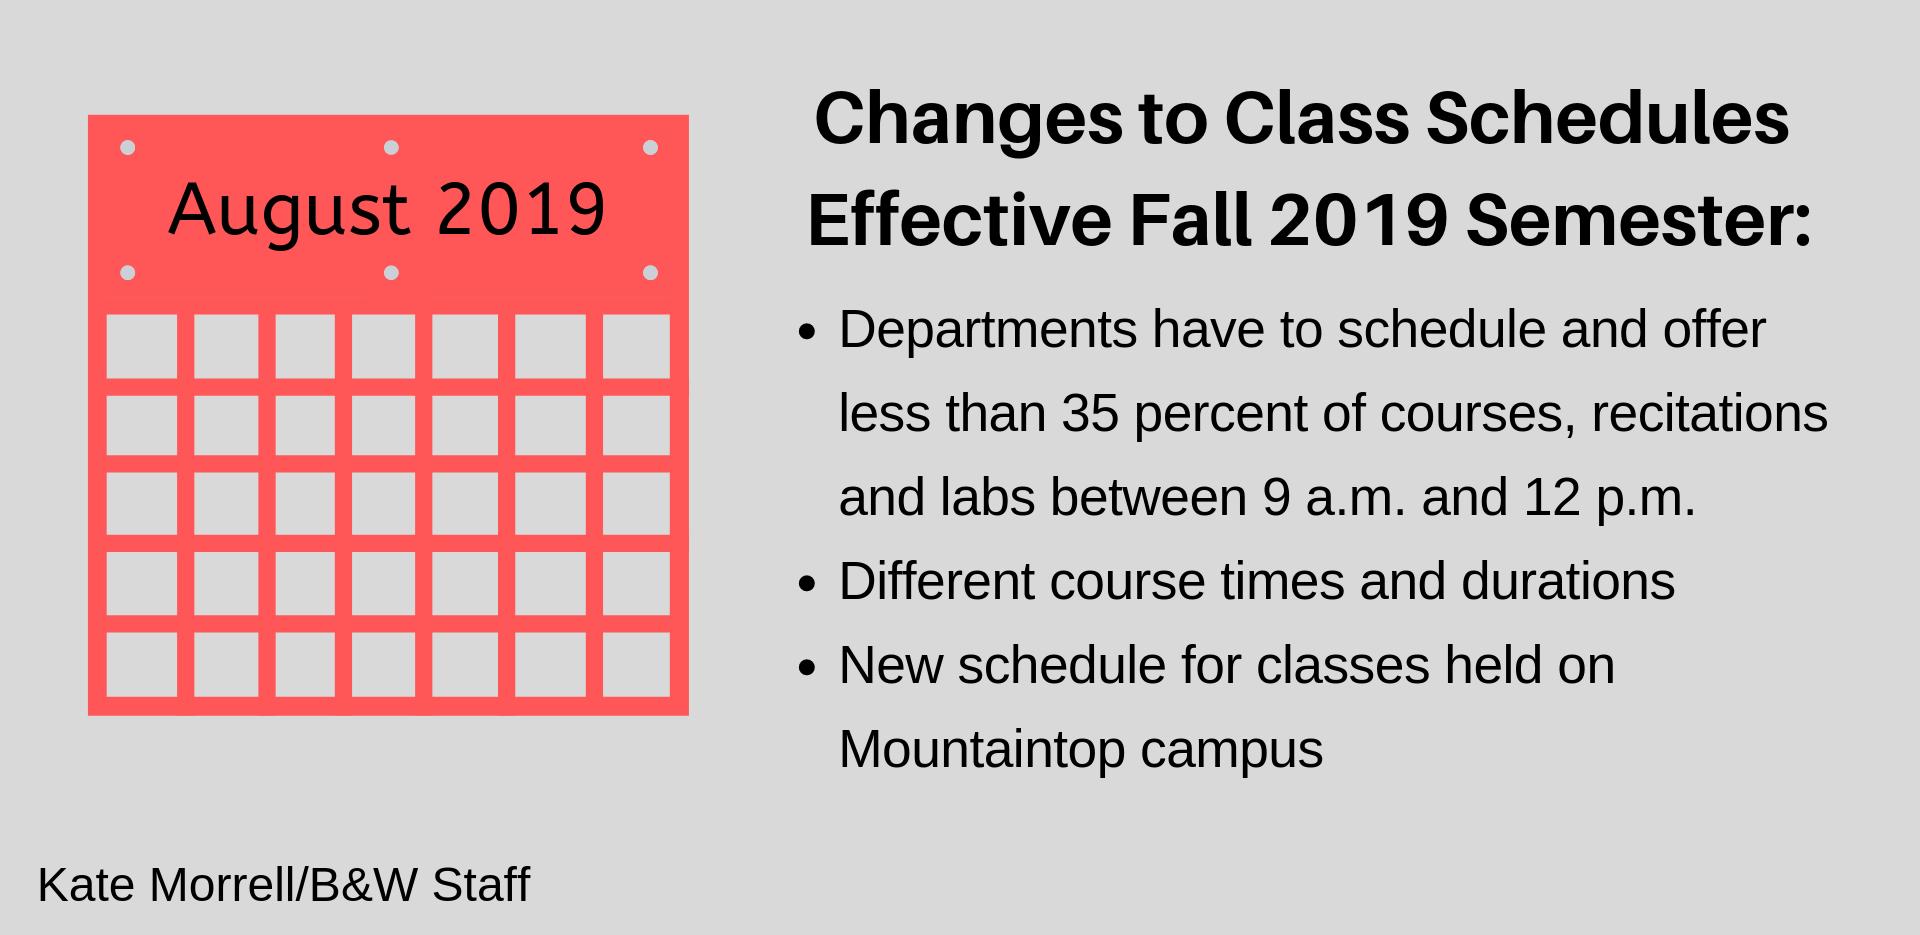 Lehigh Class Schedule To Change In Fall